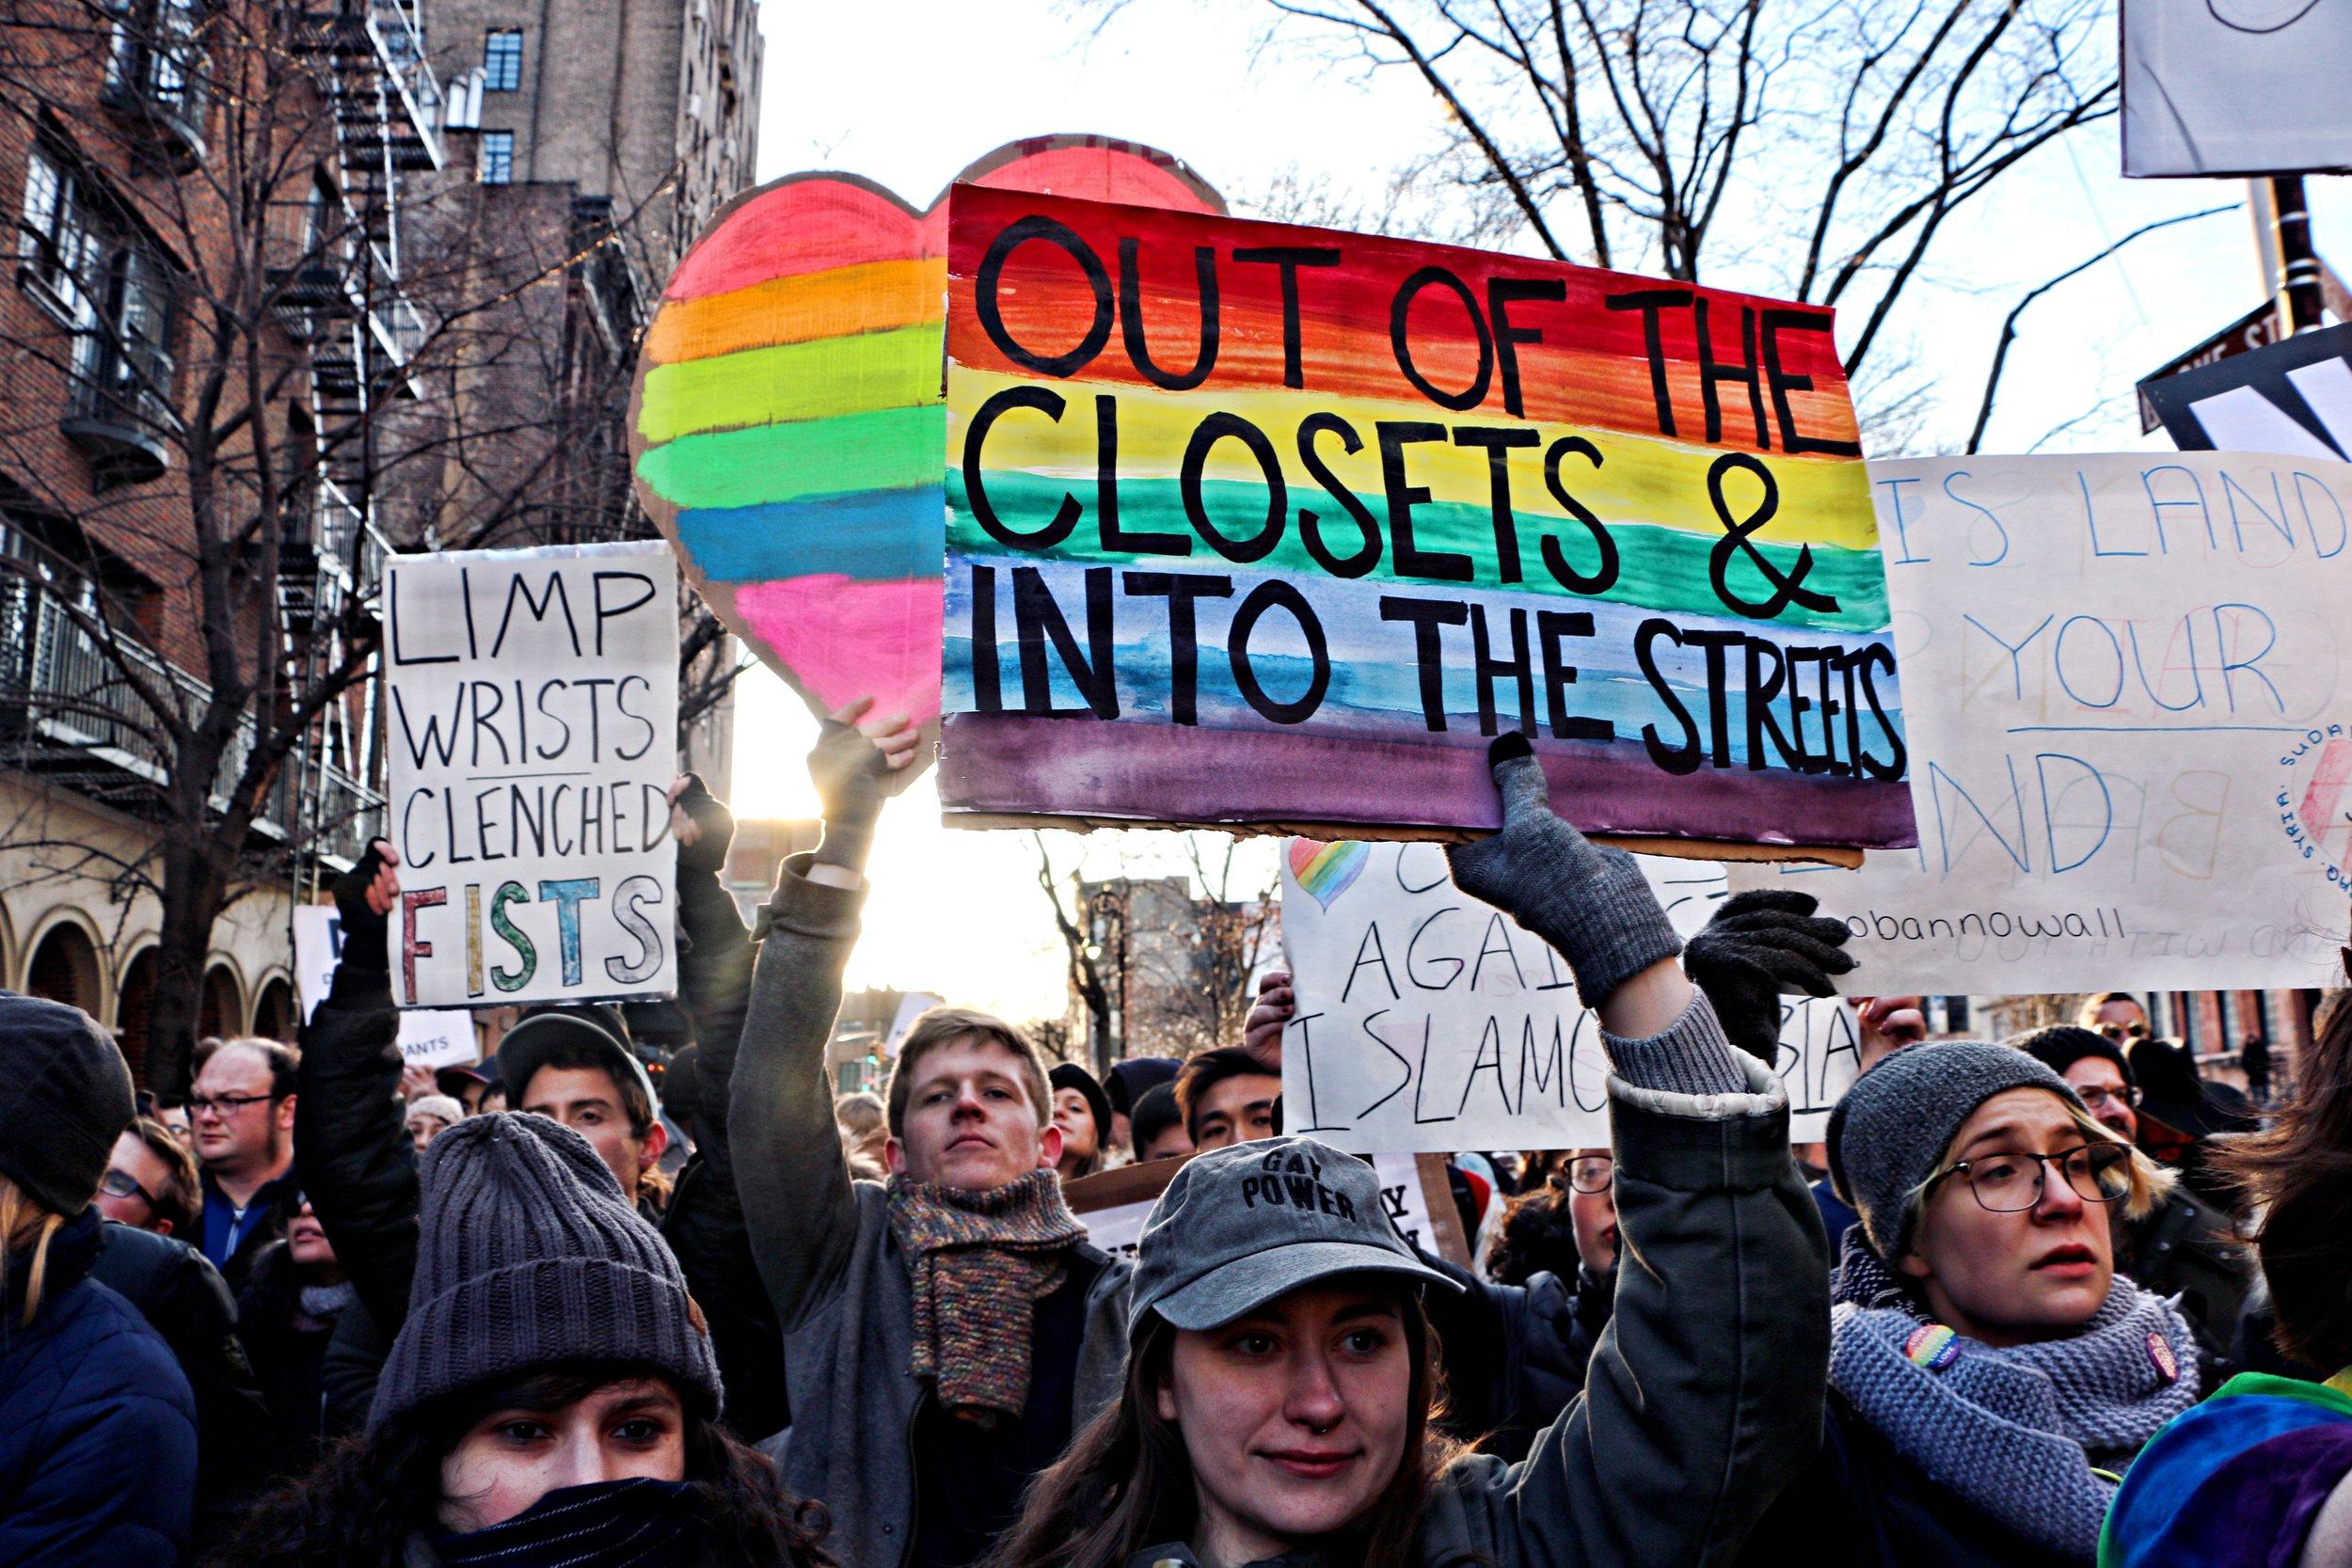 Historic Stonewall LGBTQ Rally, Stonewall Inn, February 4th, 2017